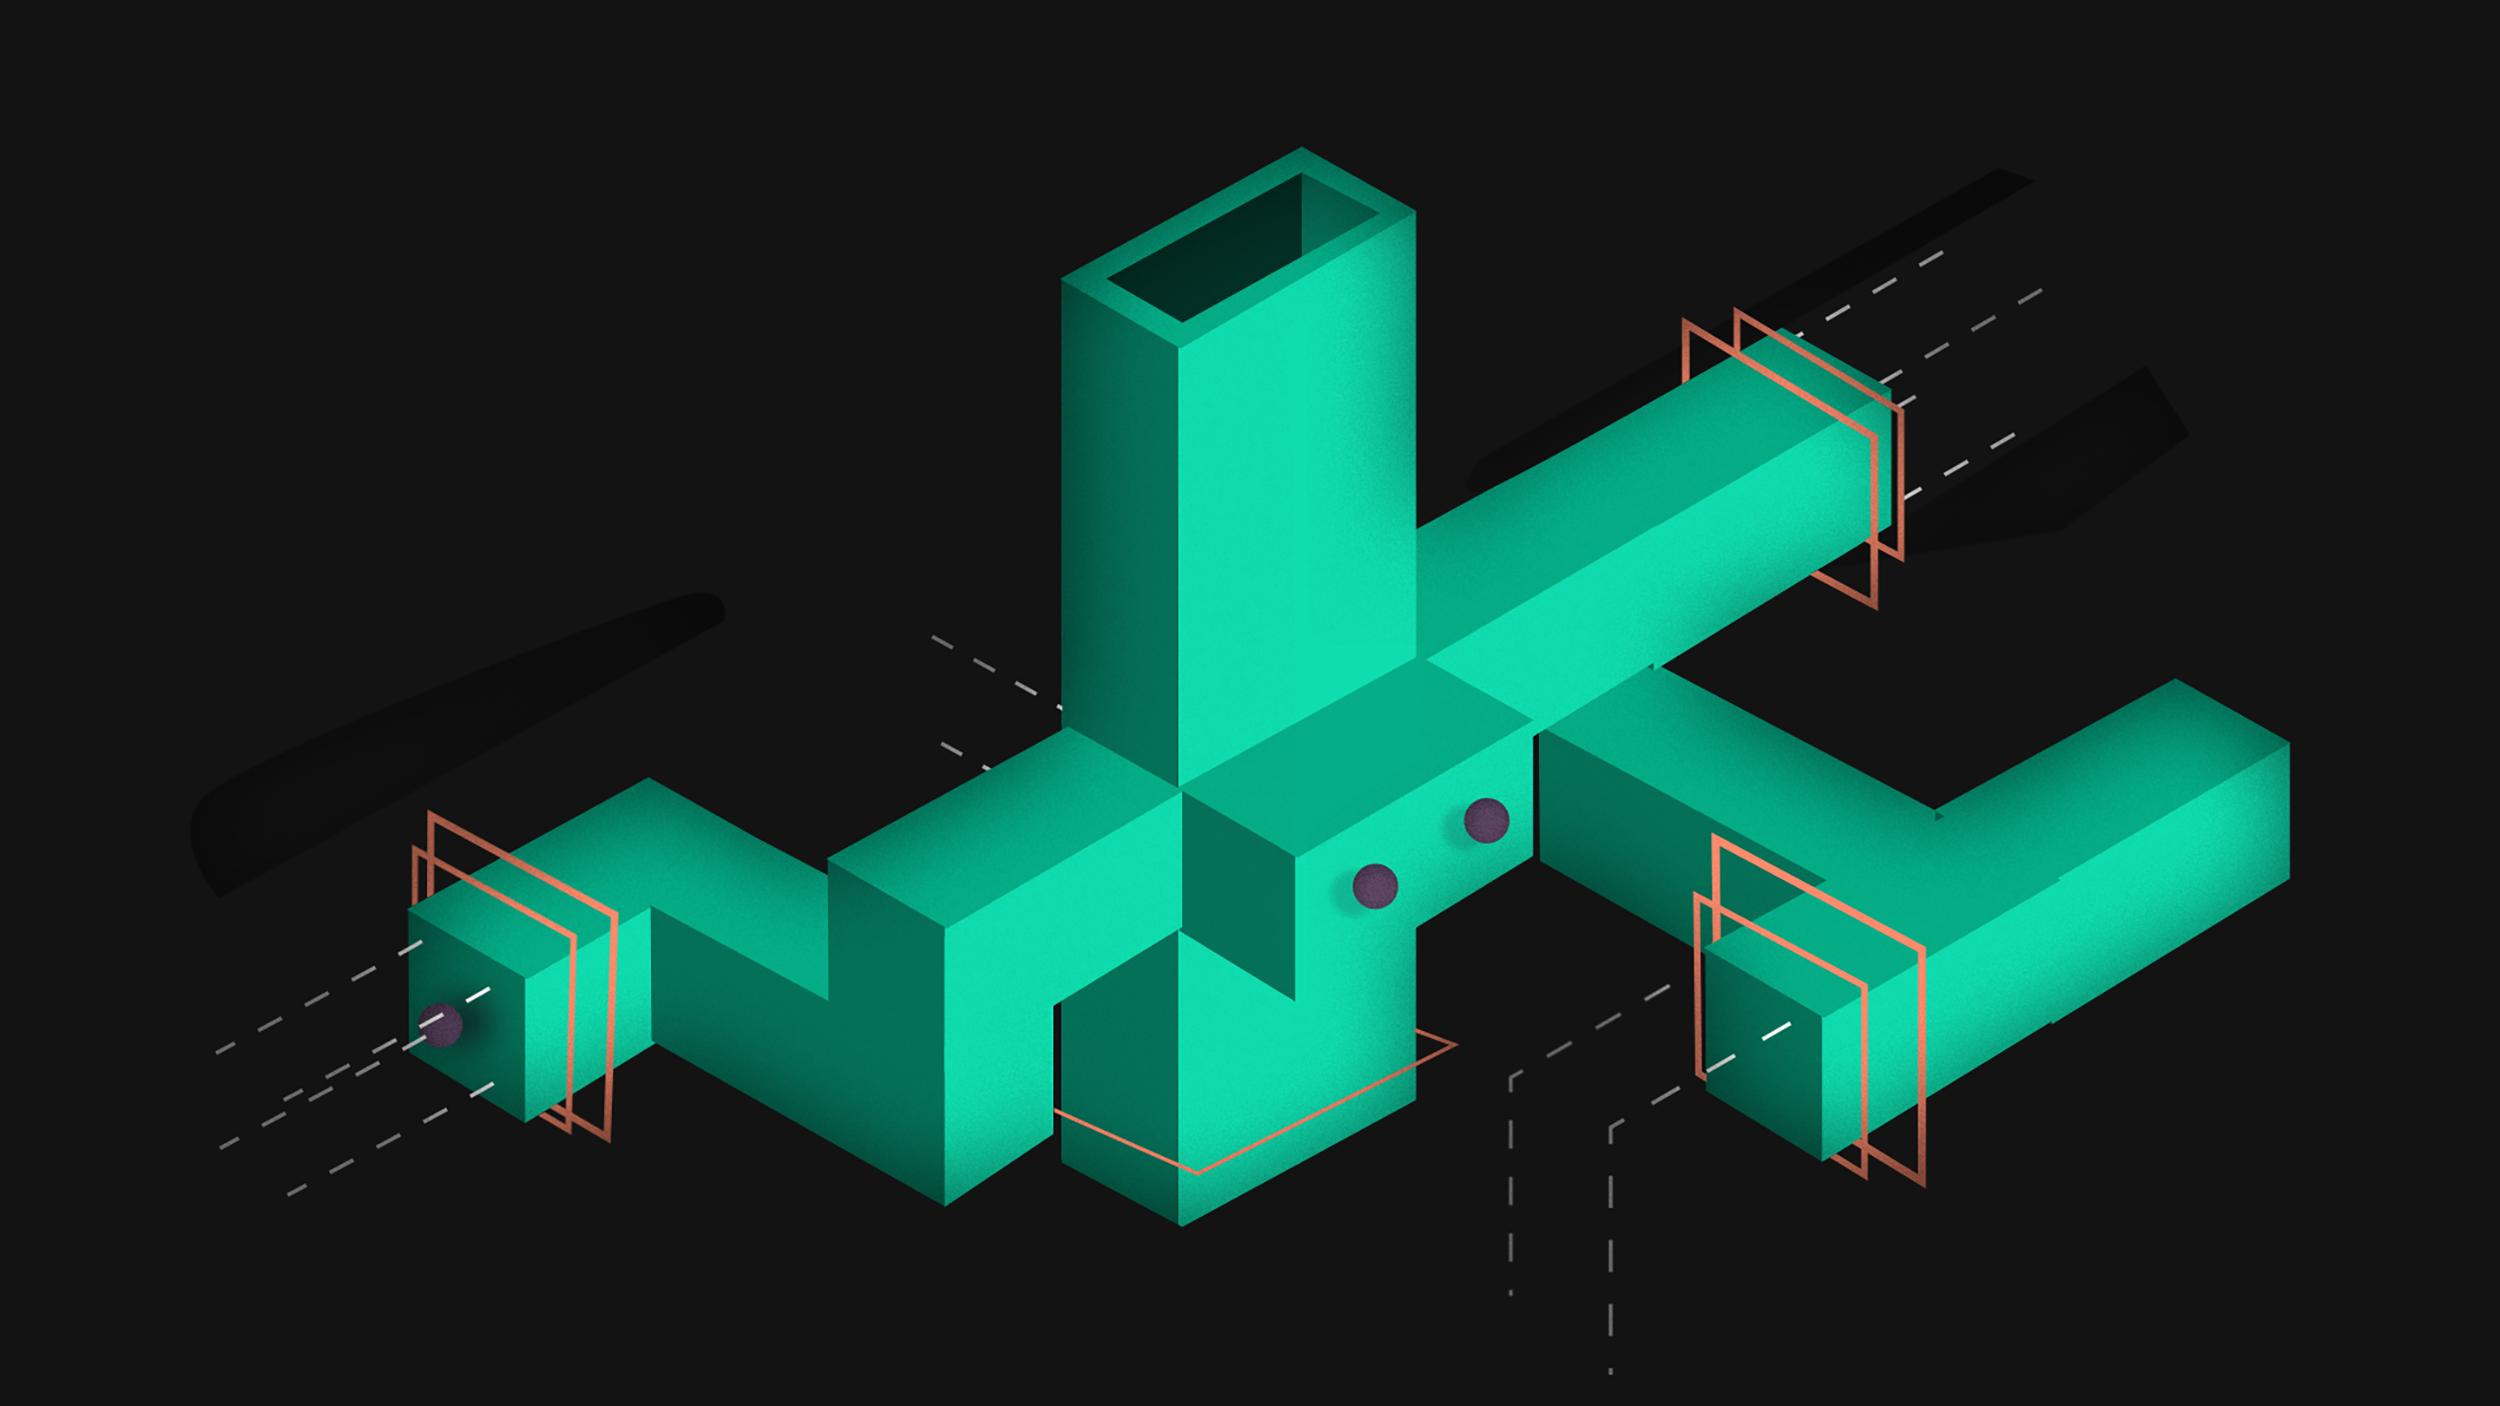 Frame_15_GROWING BOXES (00000)_1.jpg